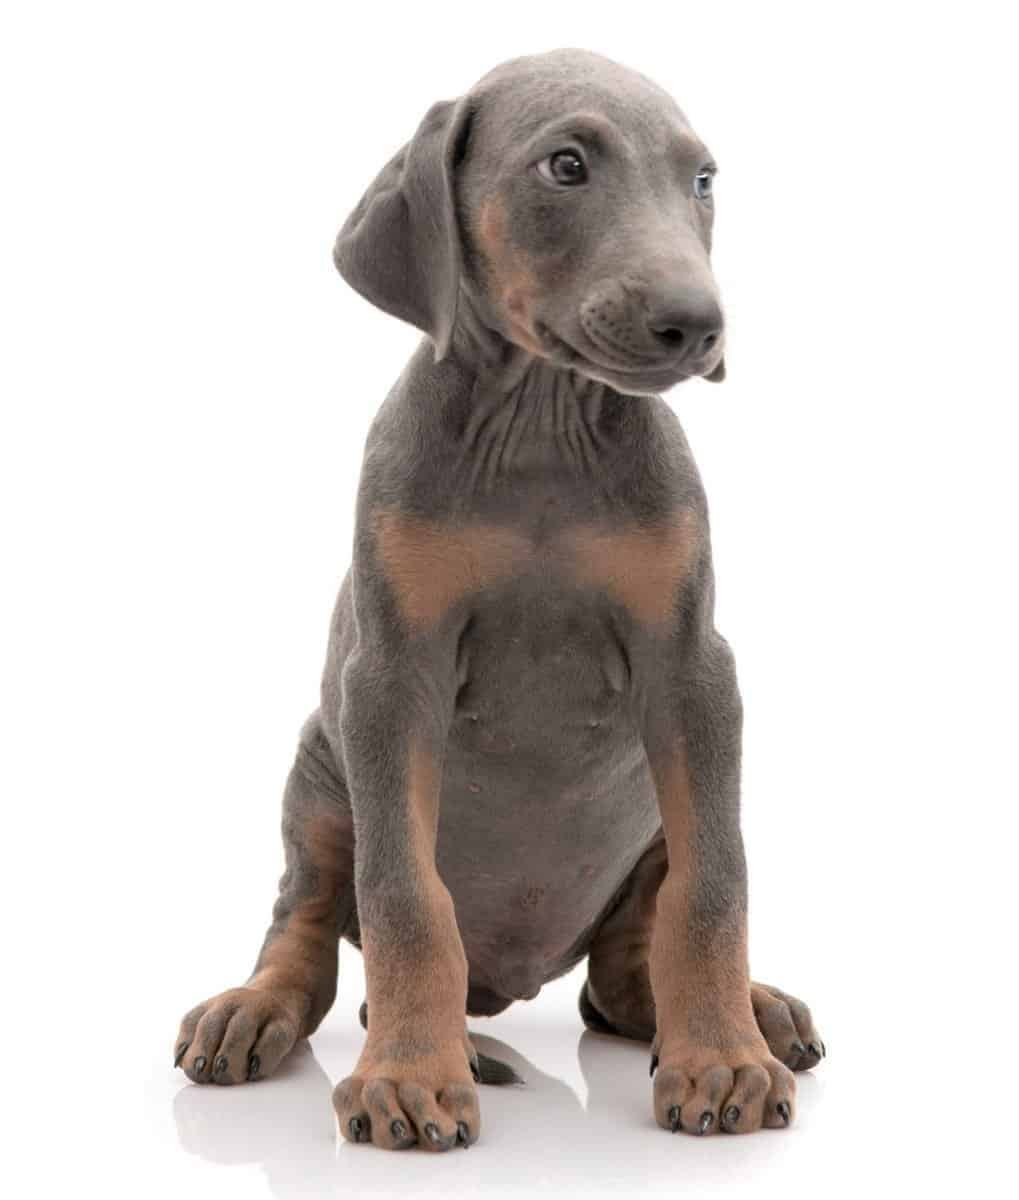 Blue Doberman puppy for sale